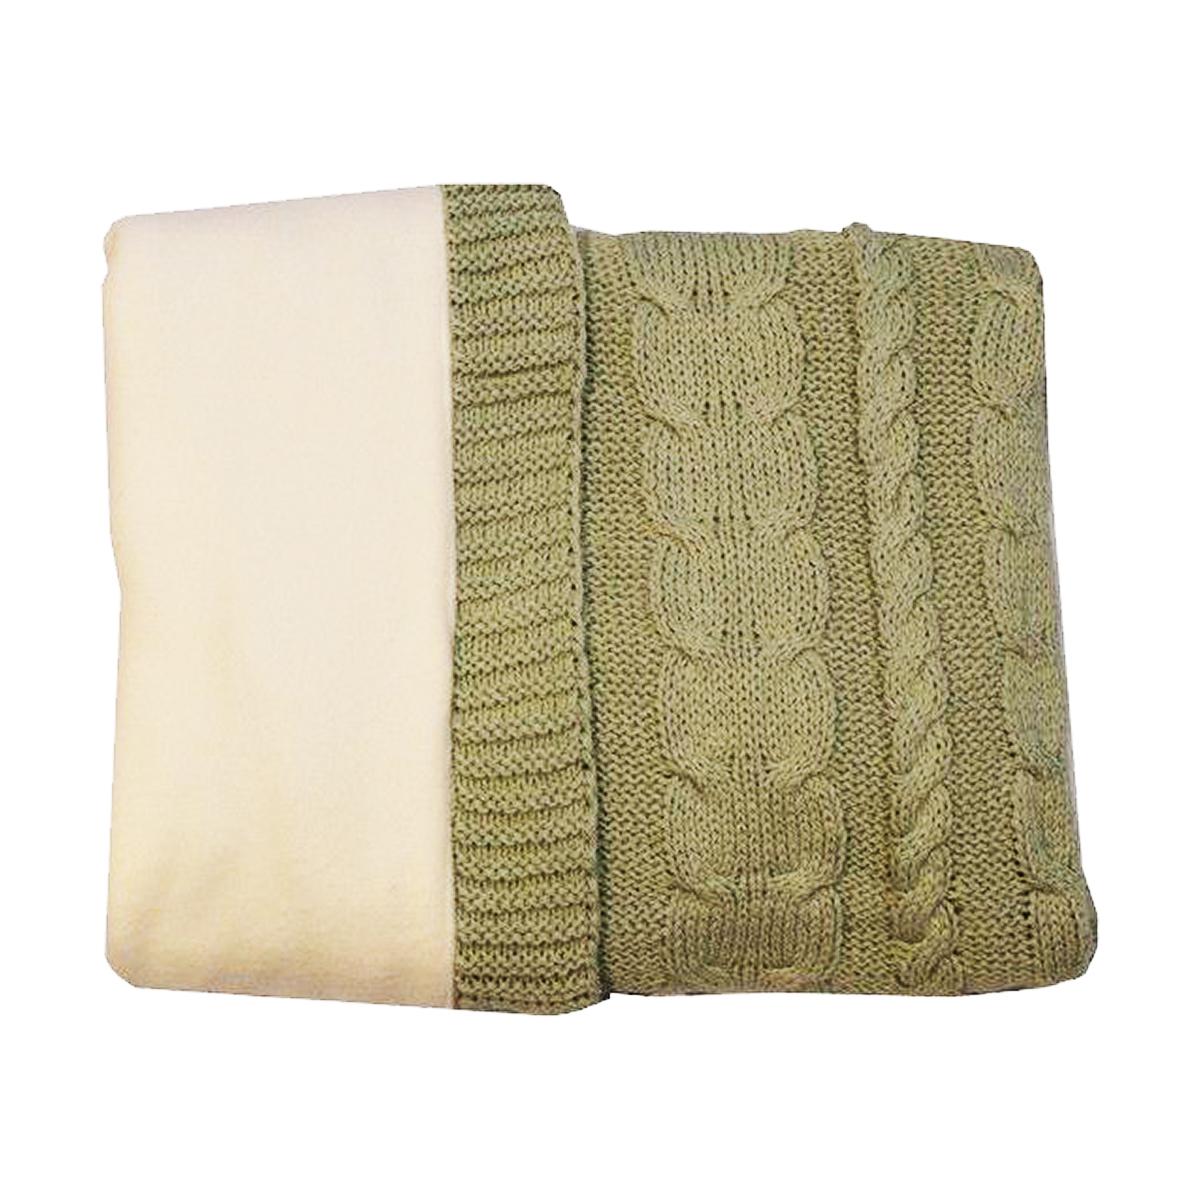 paturica bebemix pearl de iarna 80x100 cm, verde